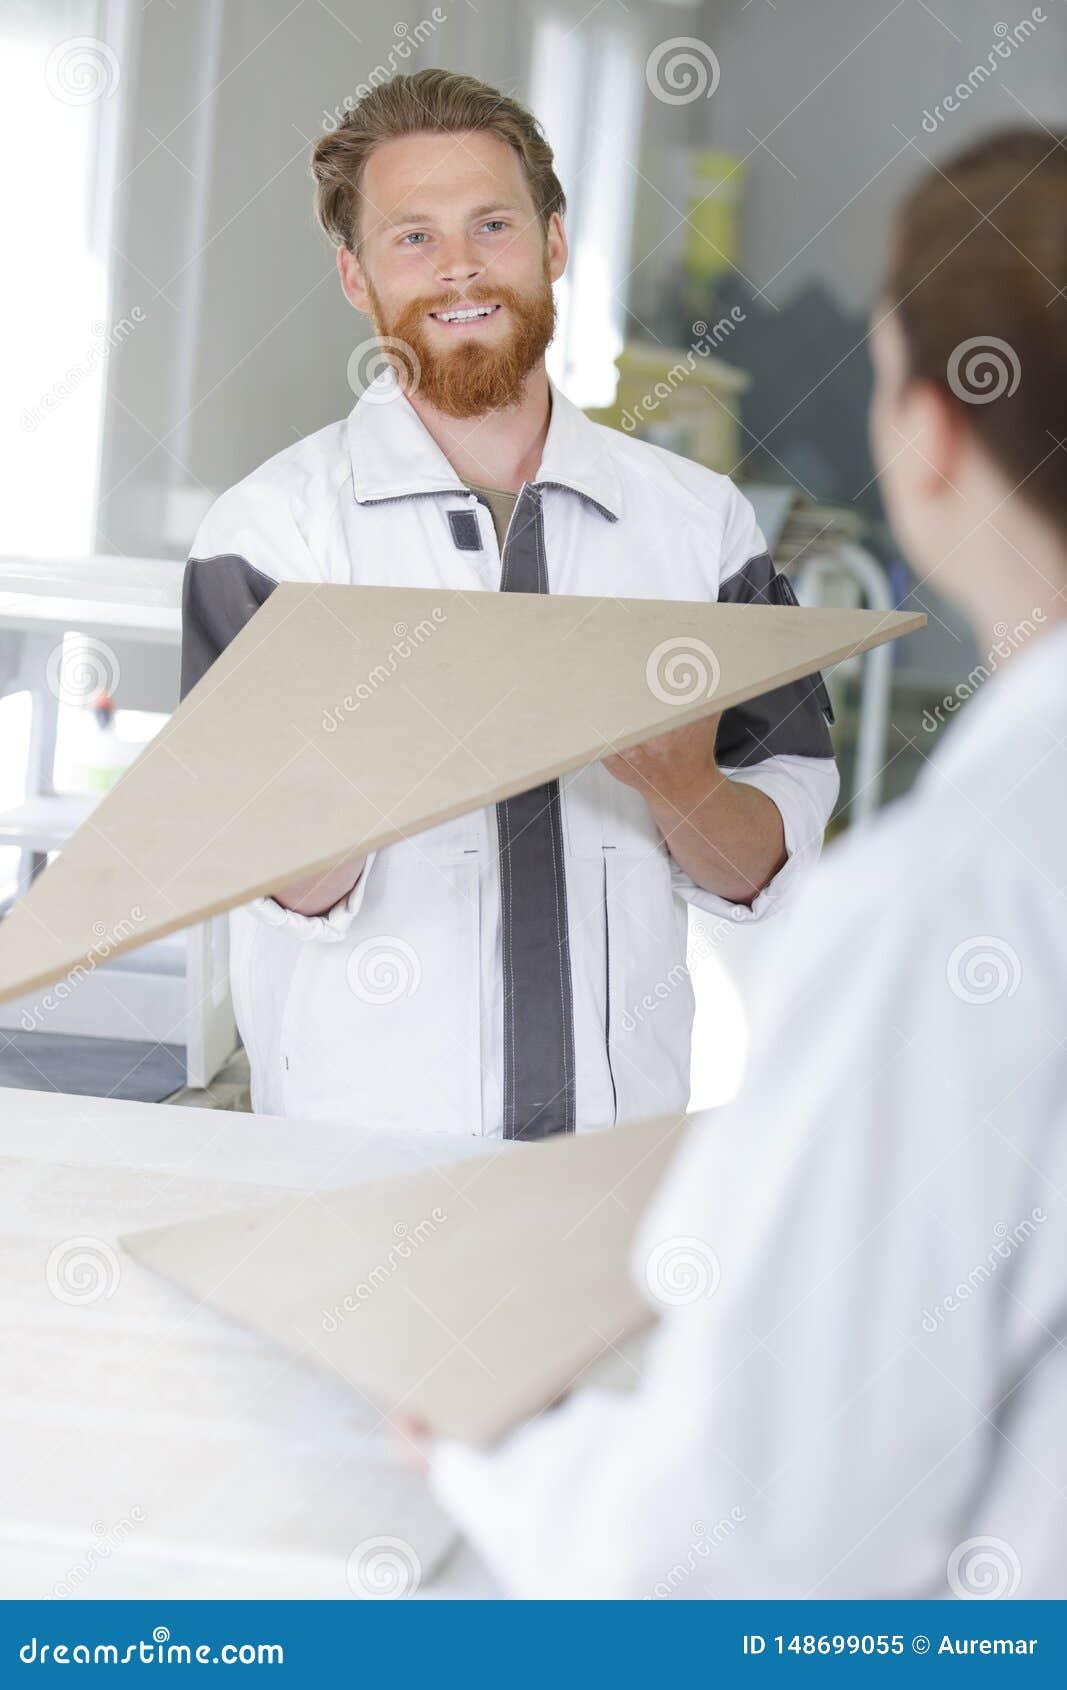 Mannen kontrollerar evennessmålarfärgapplikation